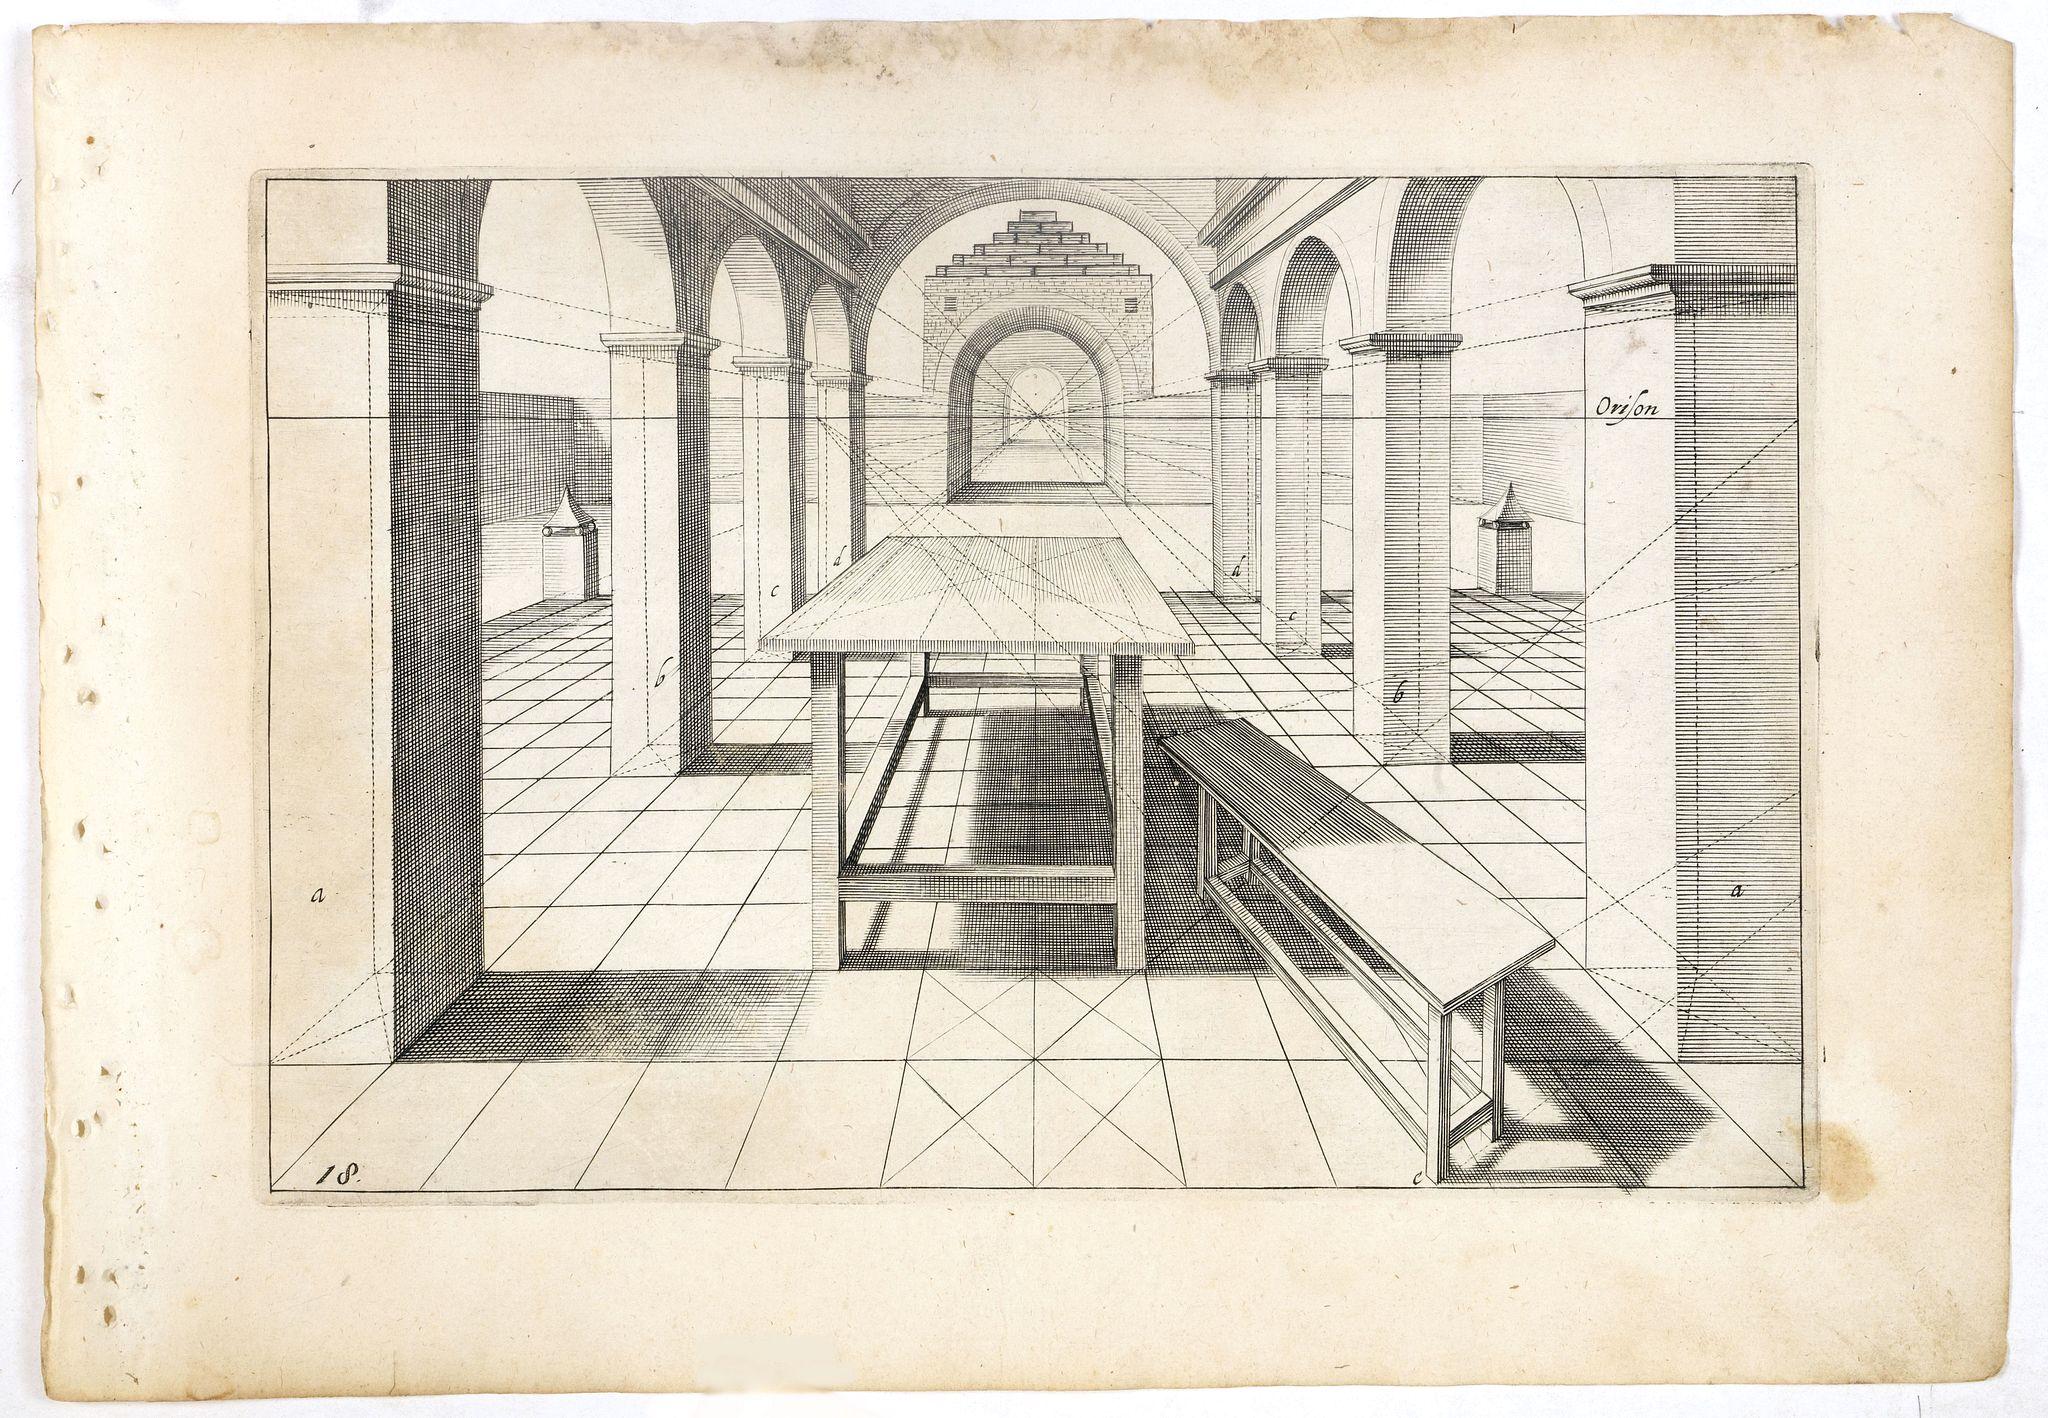 VREDEMAN DE VRIES, J. / HONDIUS, H. -  Perspective print by Vredeman de Vries. 18.